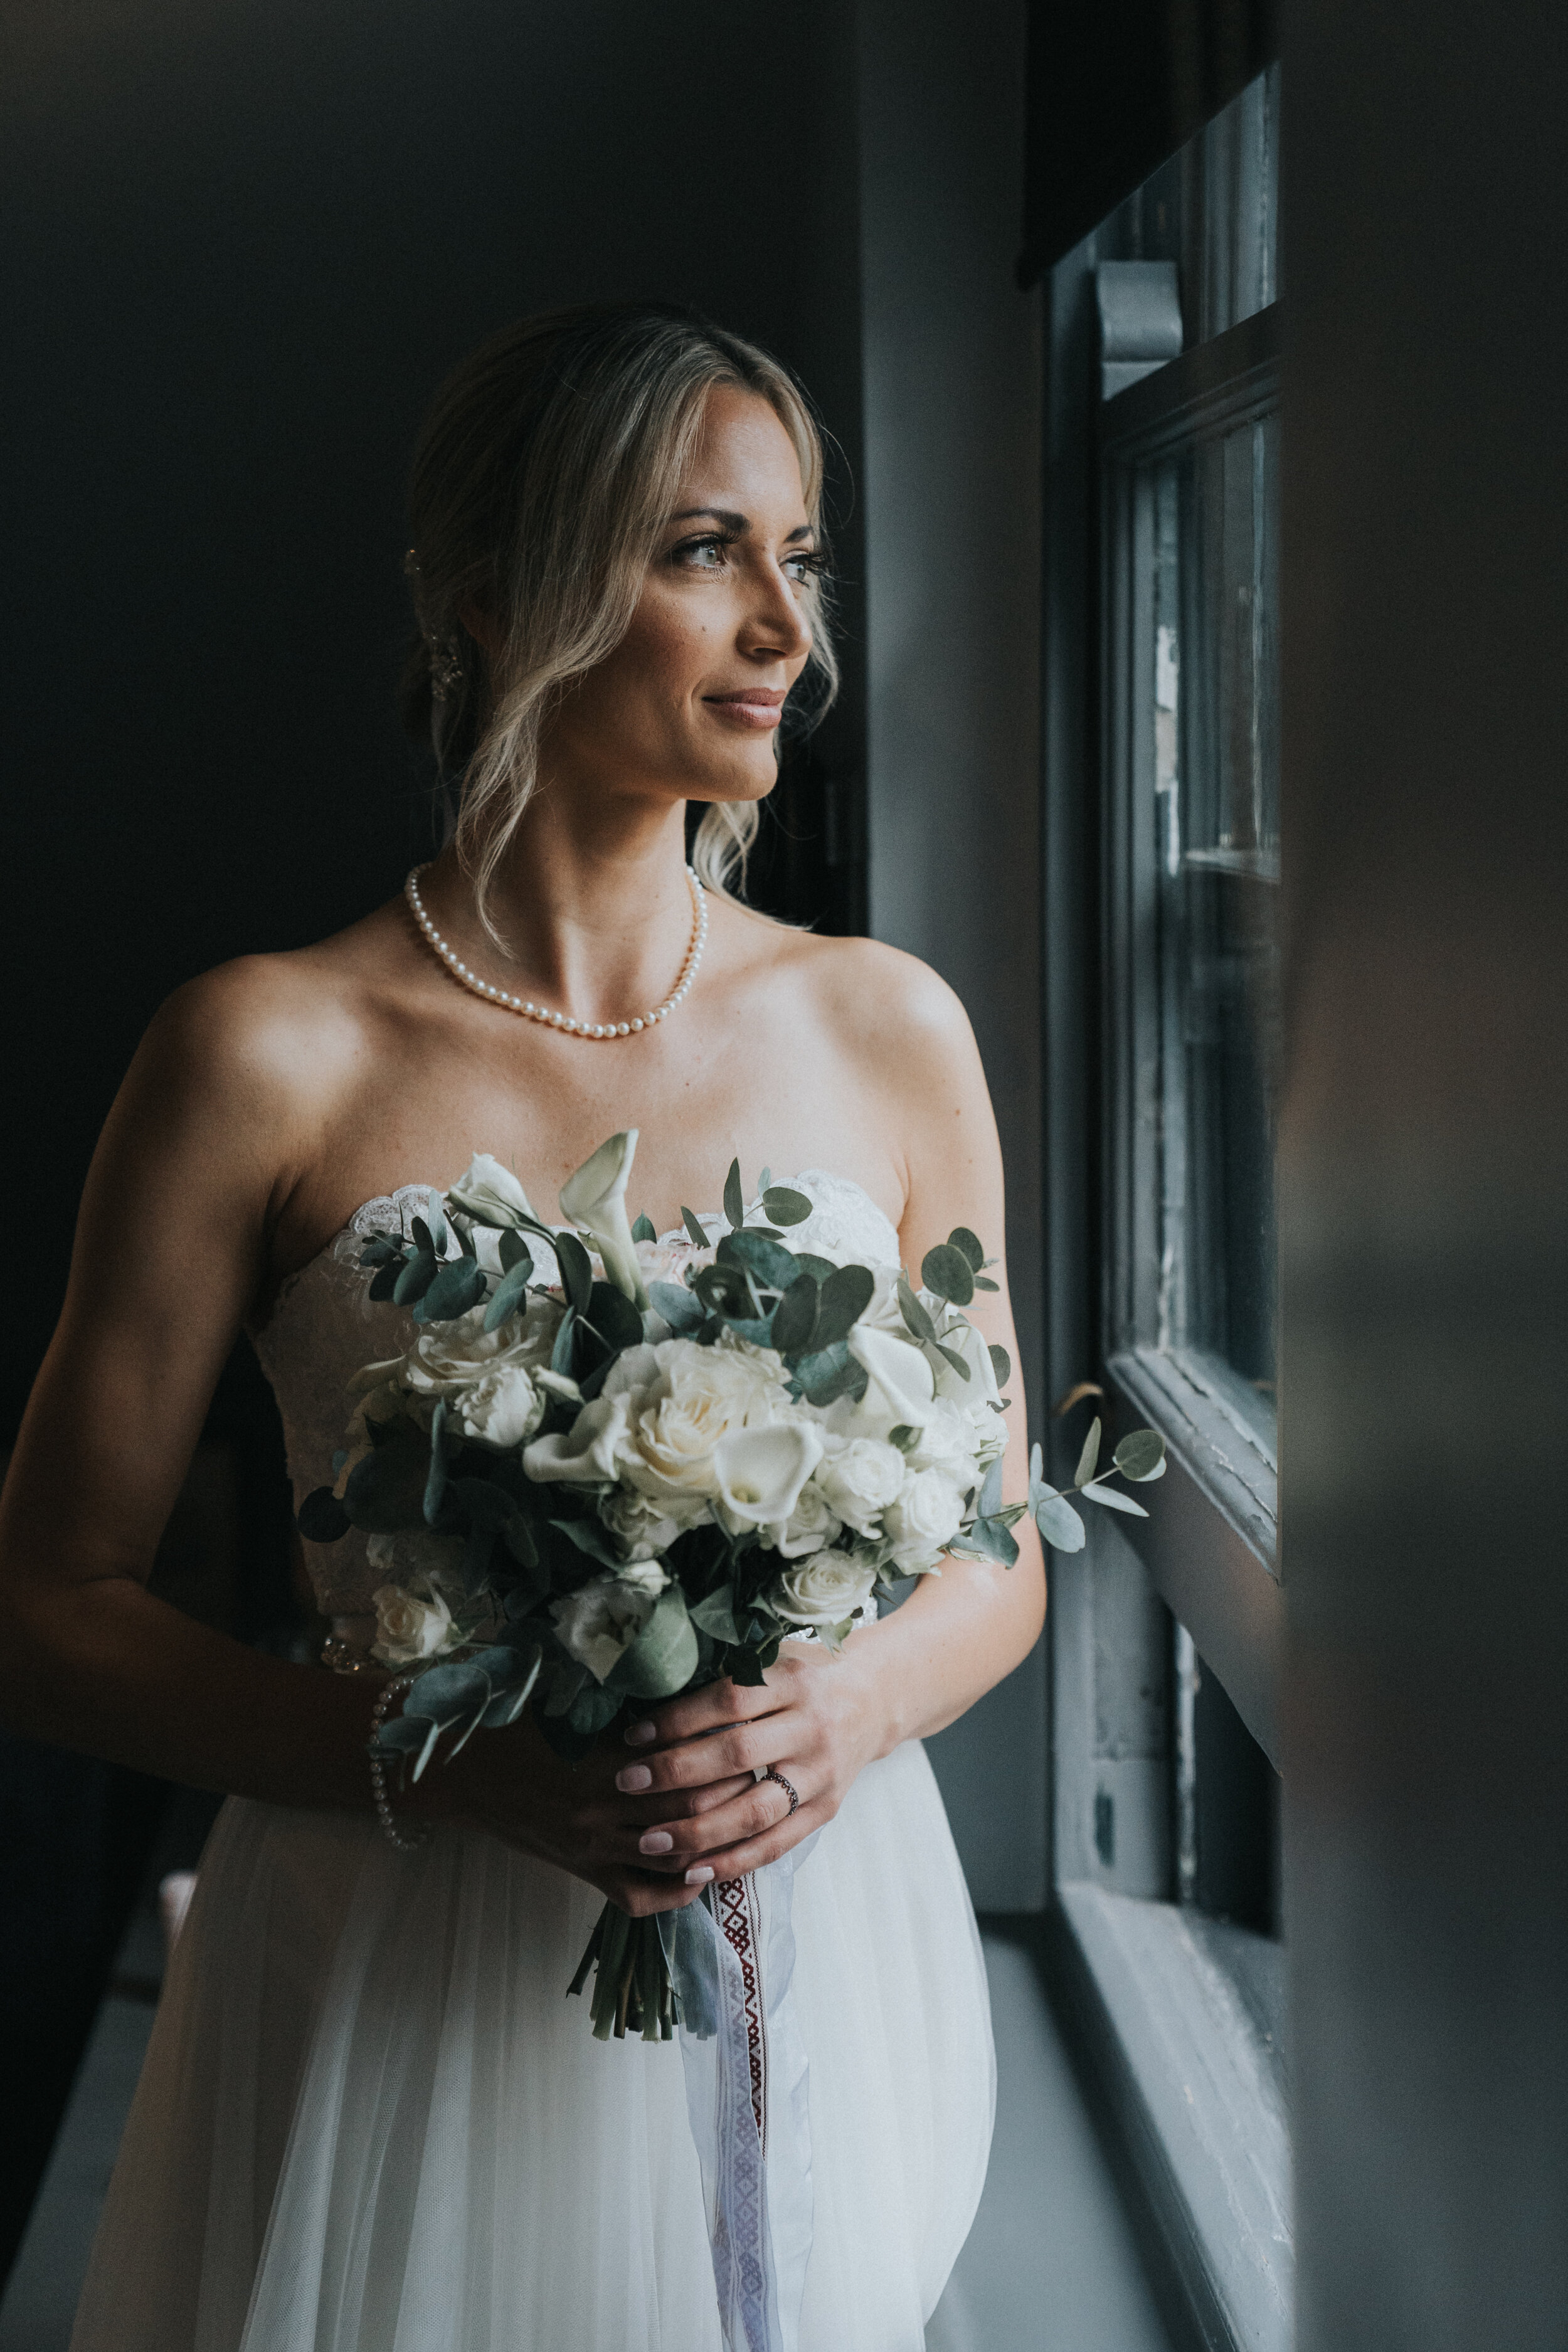 chelsea-london-wedding-photographer-videographer-blakes-hotel-1122